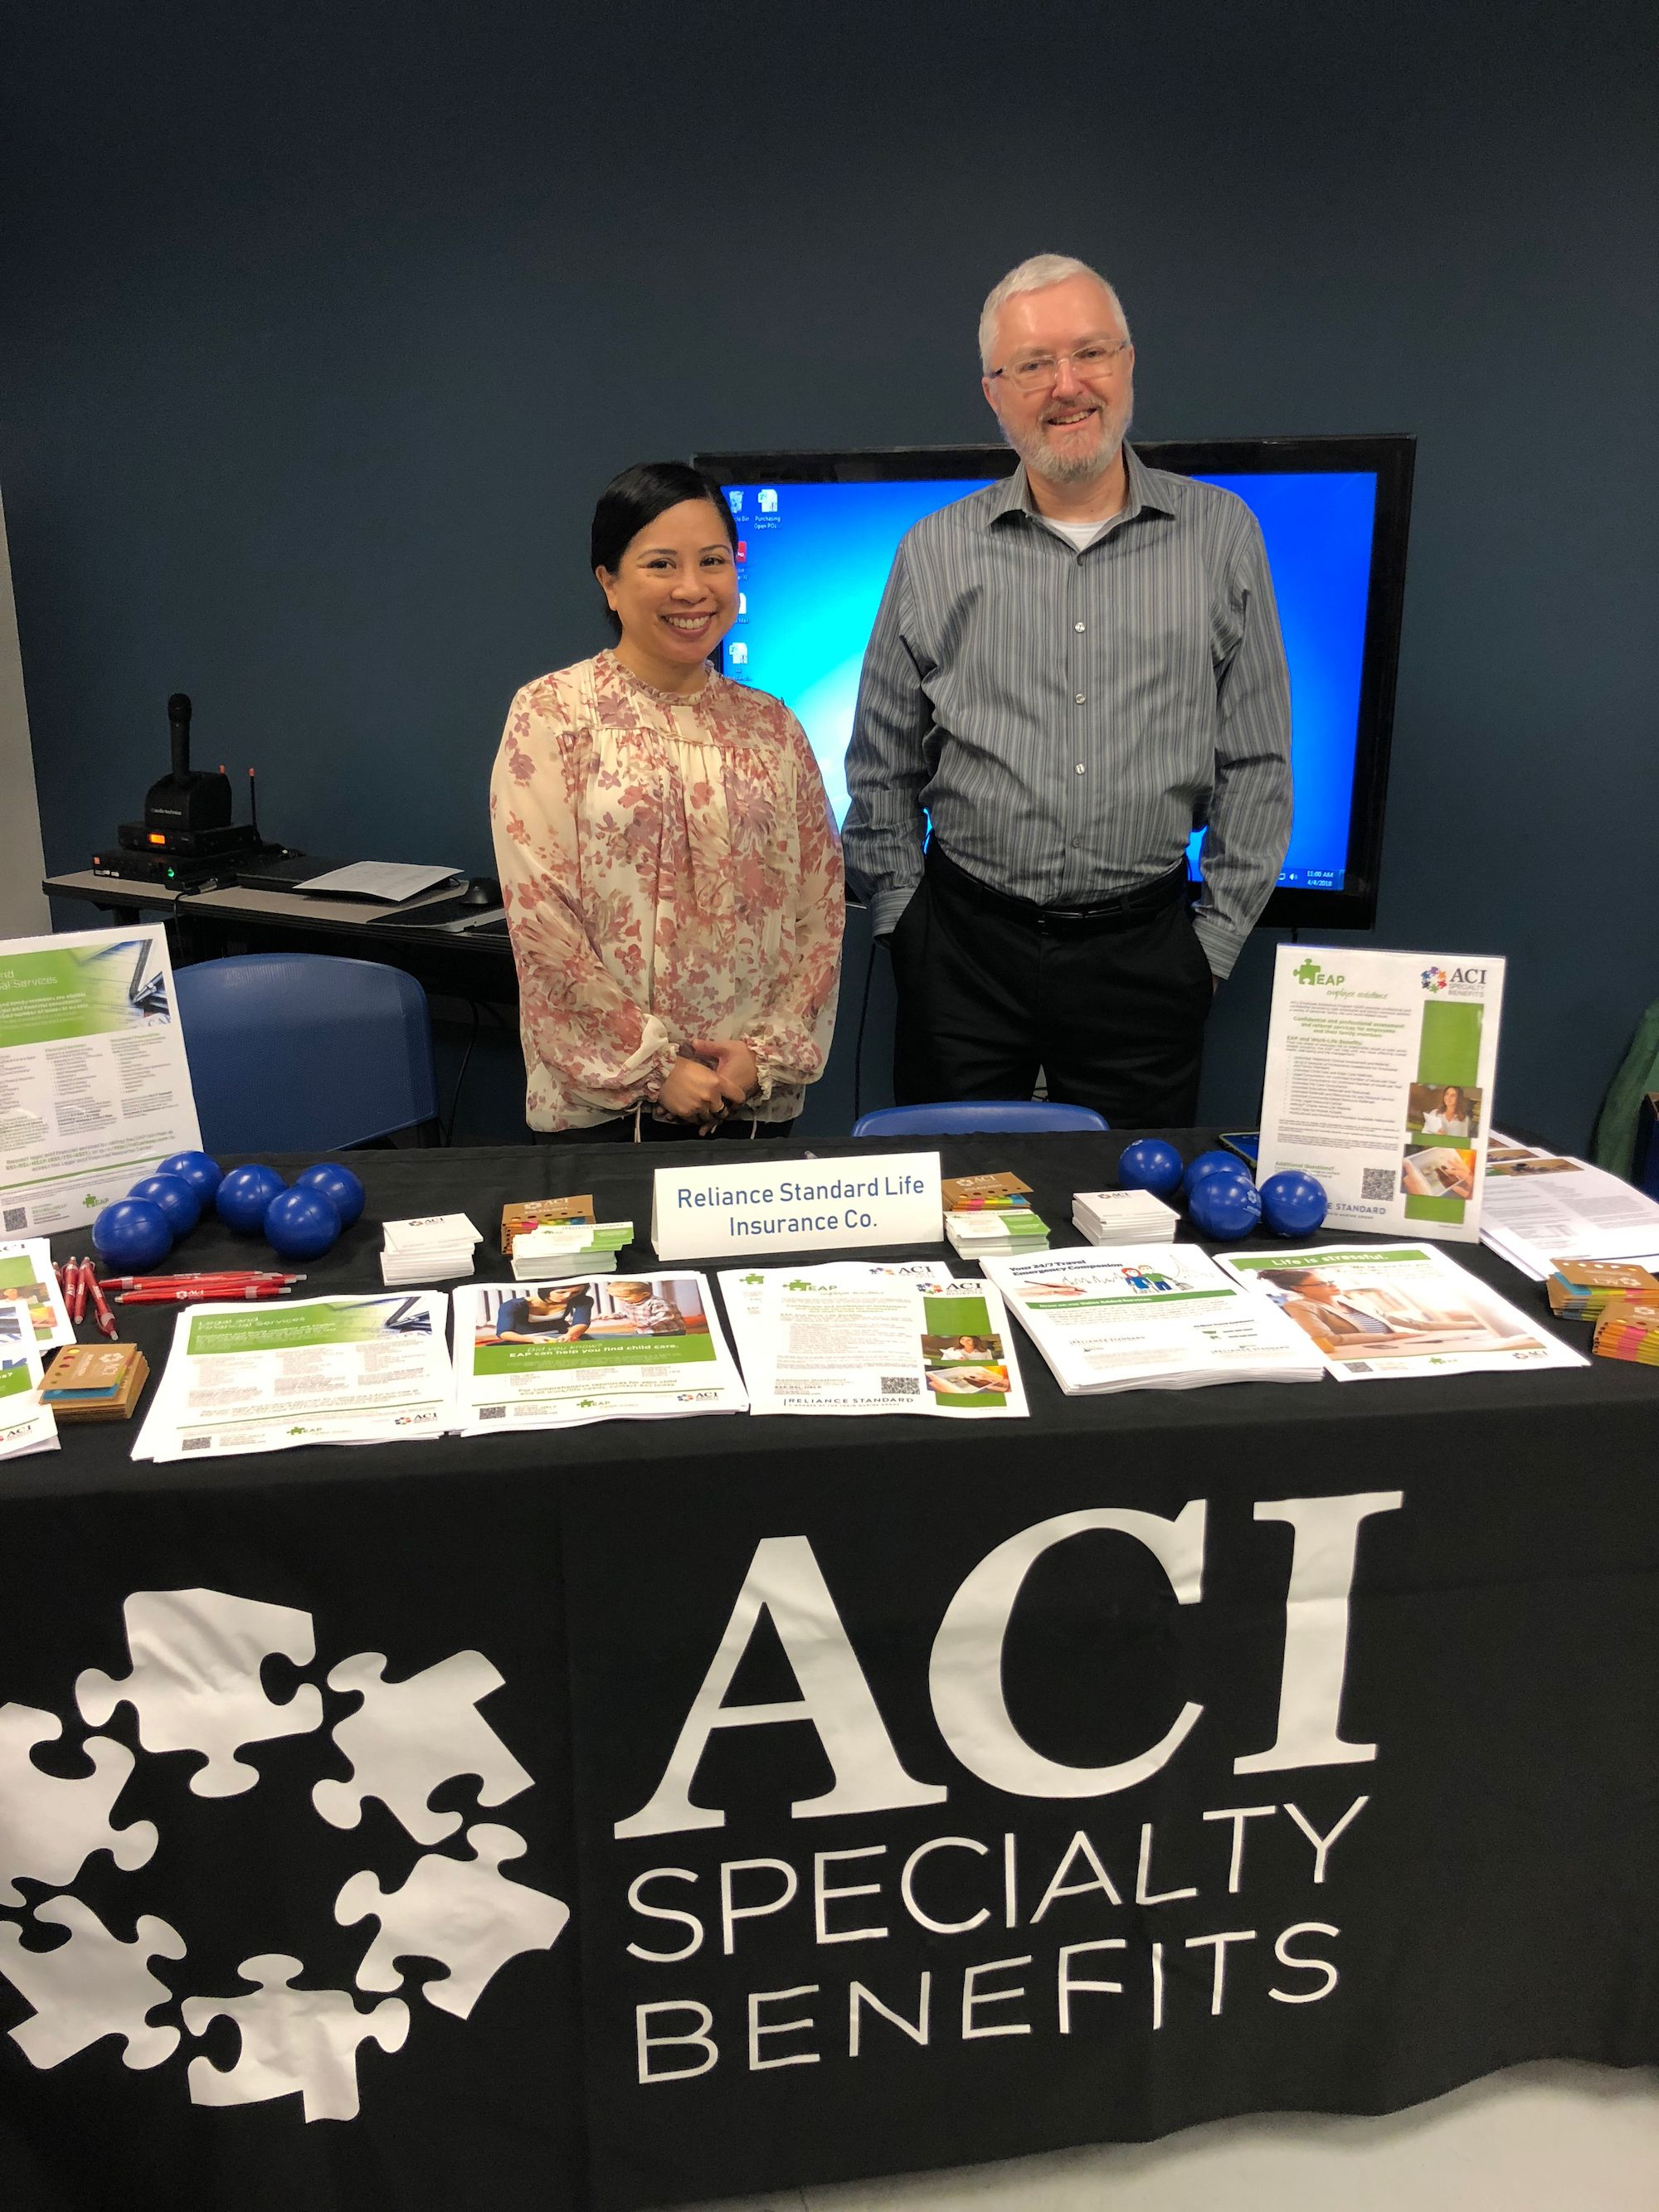 ACI Account Manager Yve is at LISI AEROSPACE's Health Fair